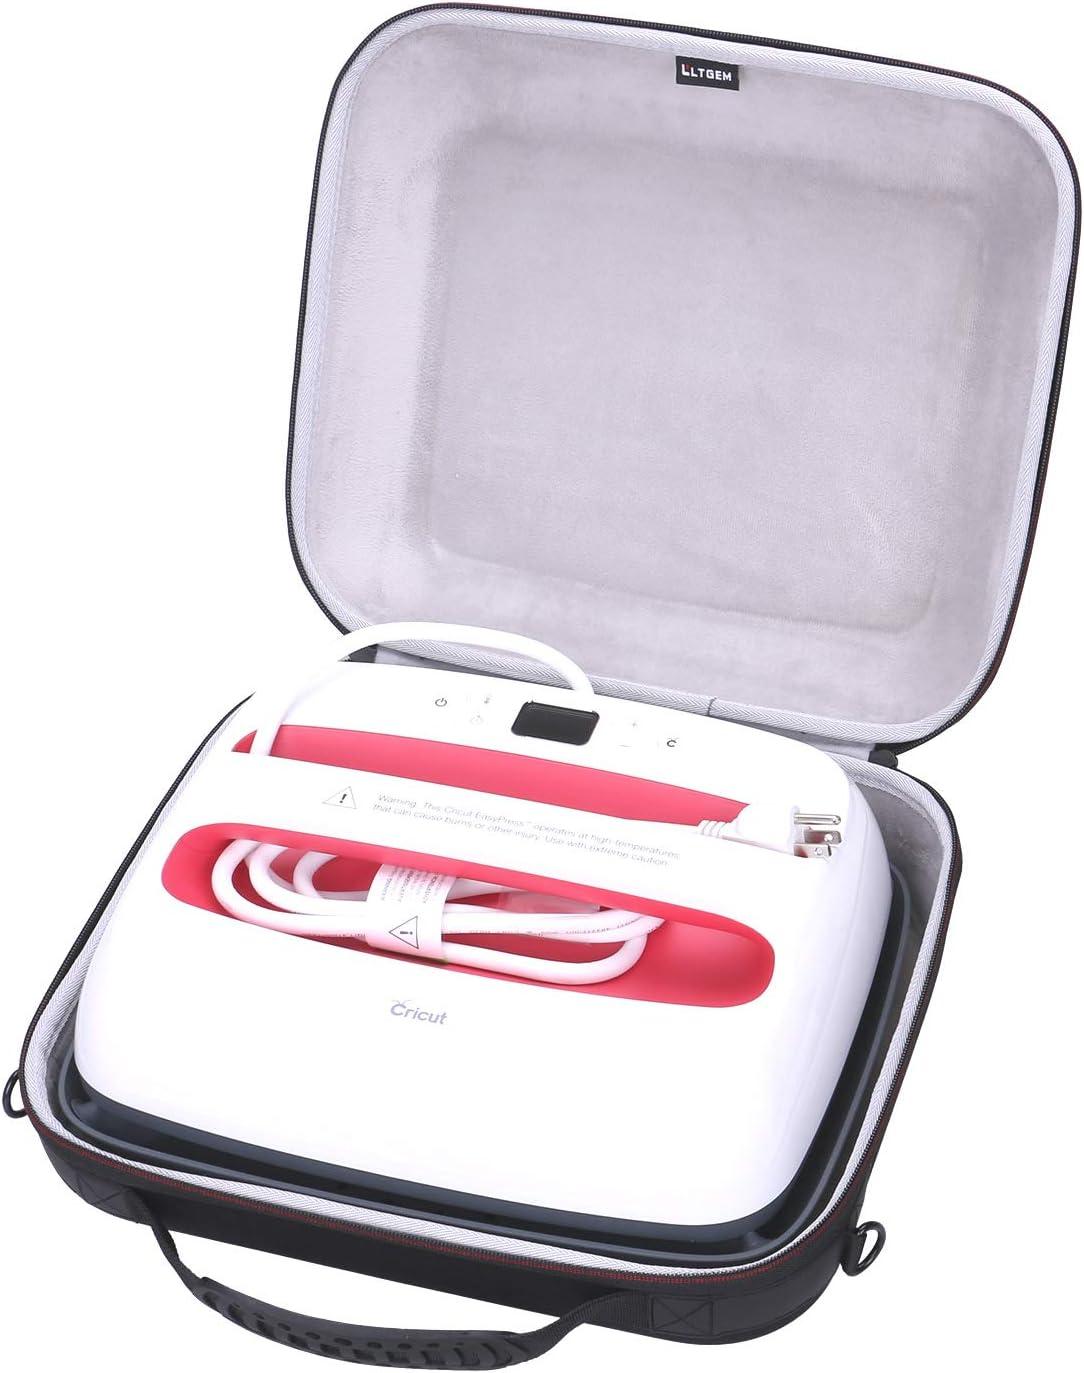 LTGEM Storage Protective Carry Case Bag For Cricut EasyPress Heat Press Machine